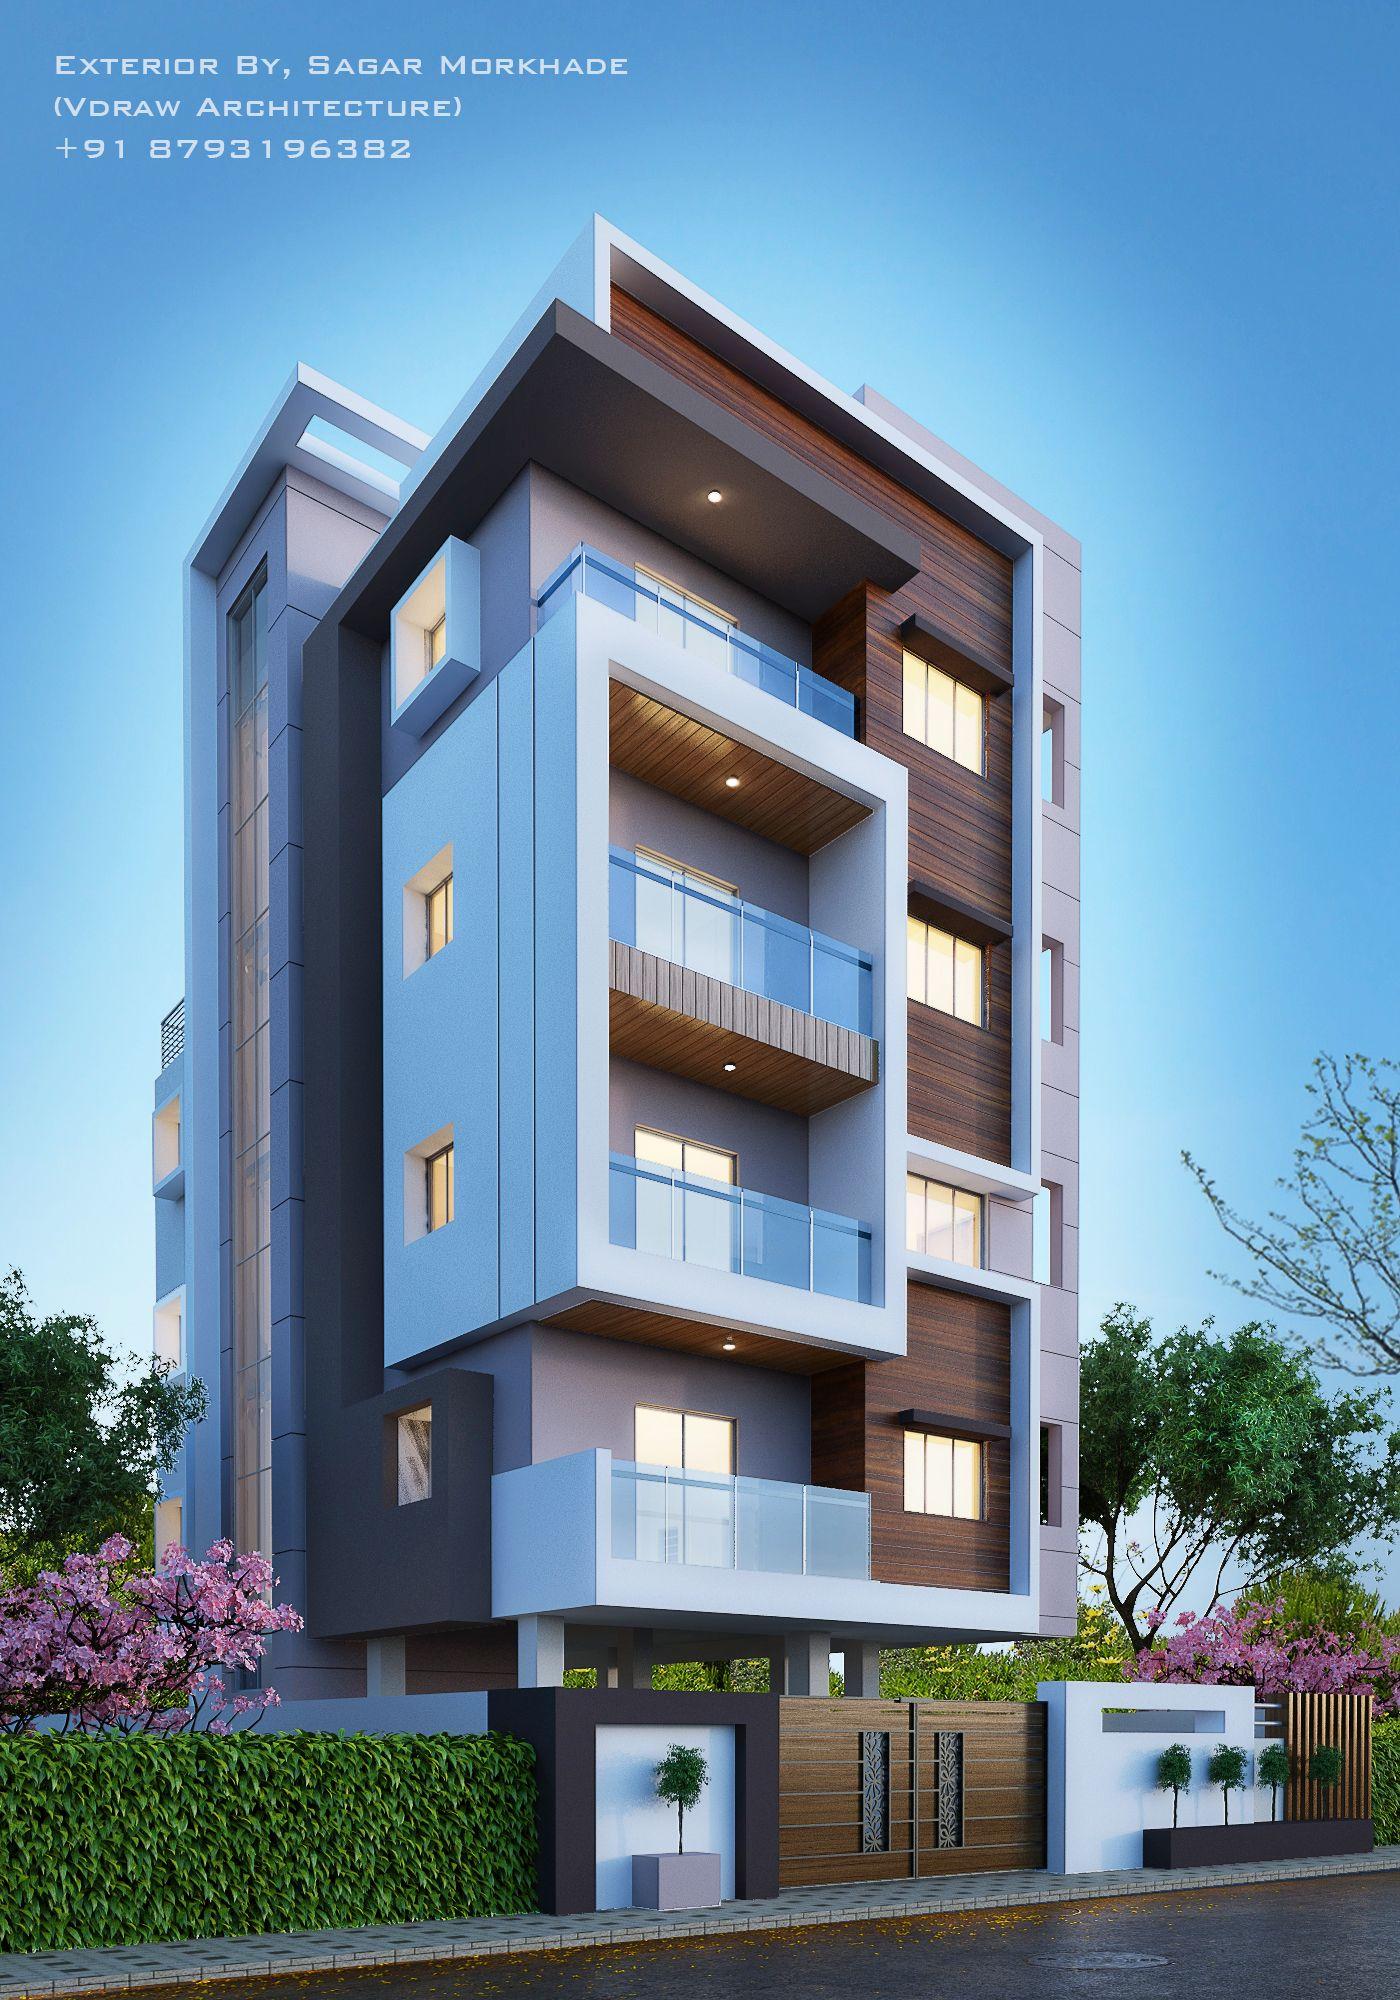 Residential Design: Modern Residential Flat Scheme Exterior By, Sagar Morkhade